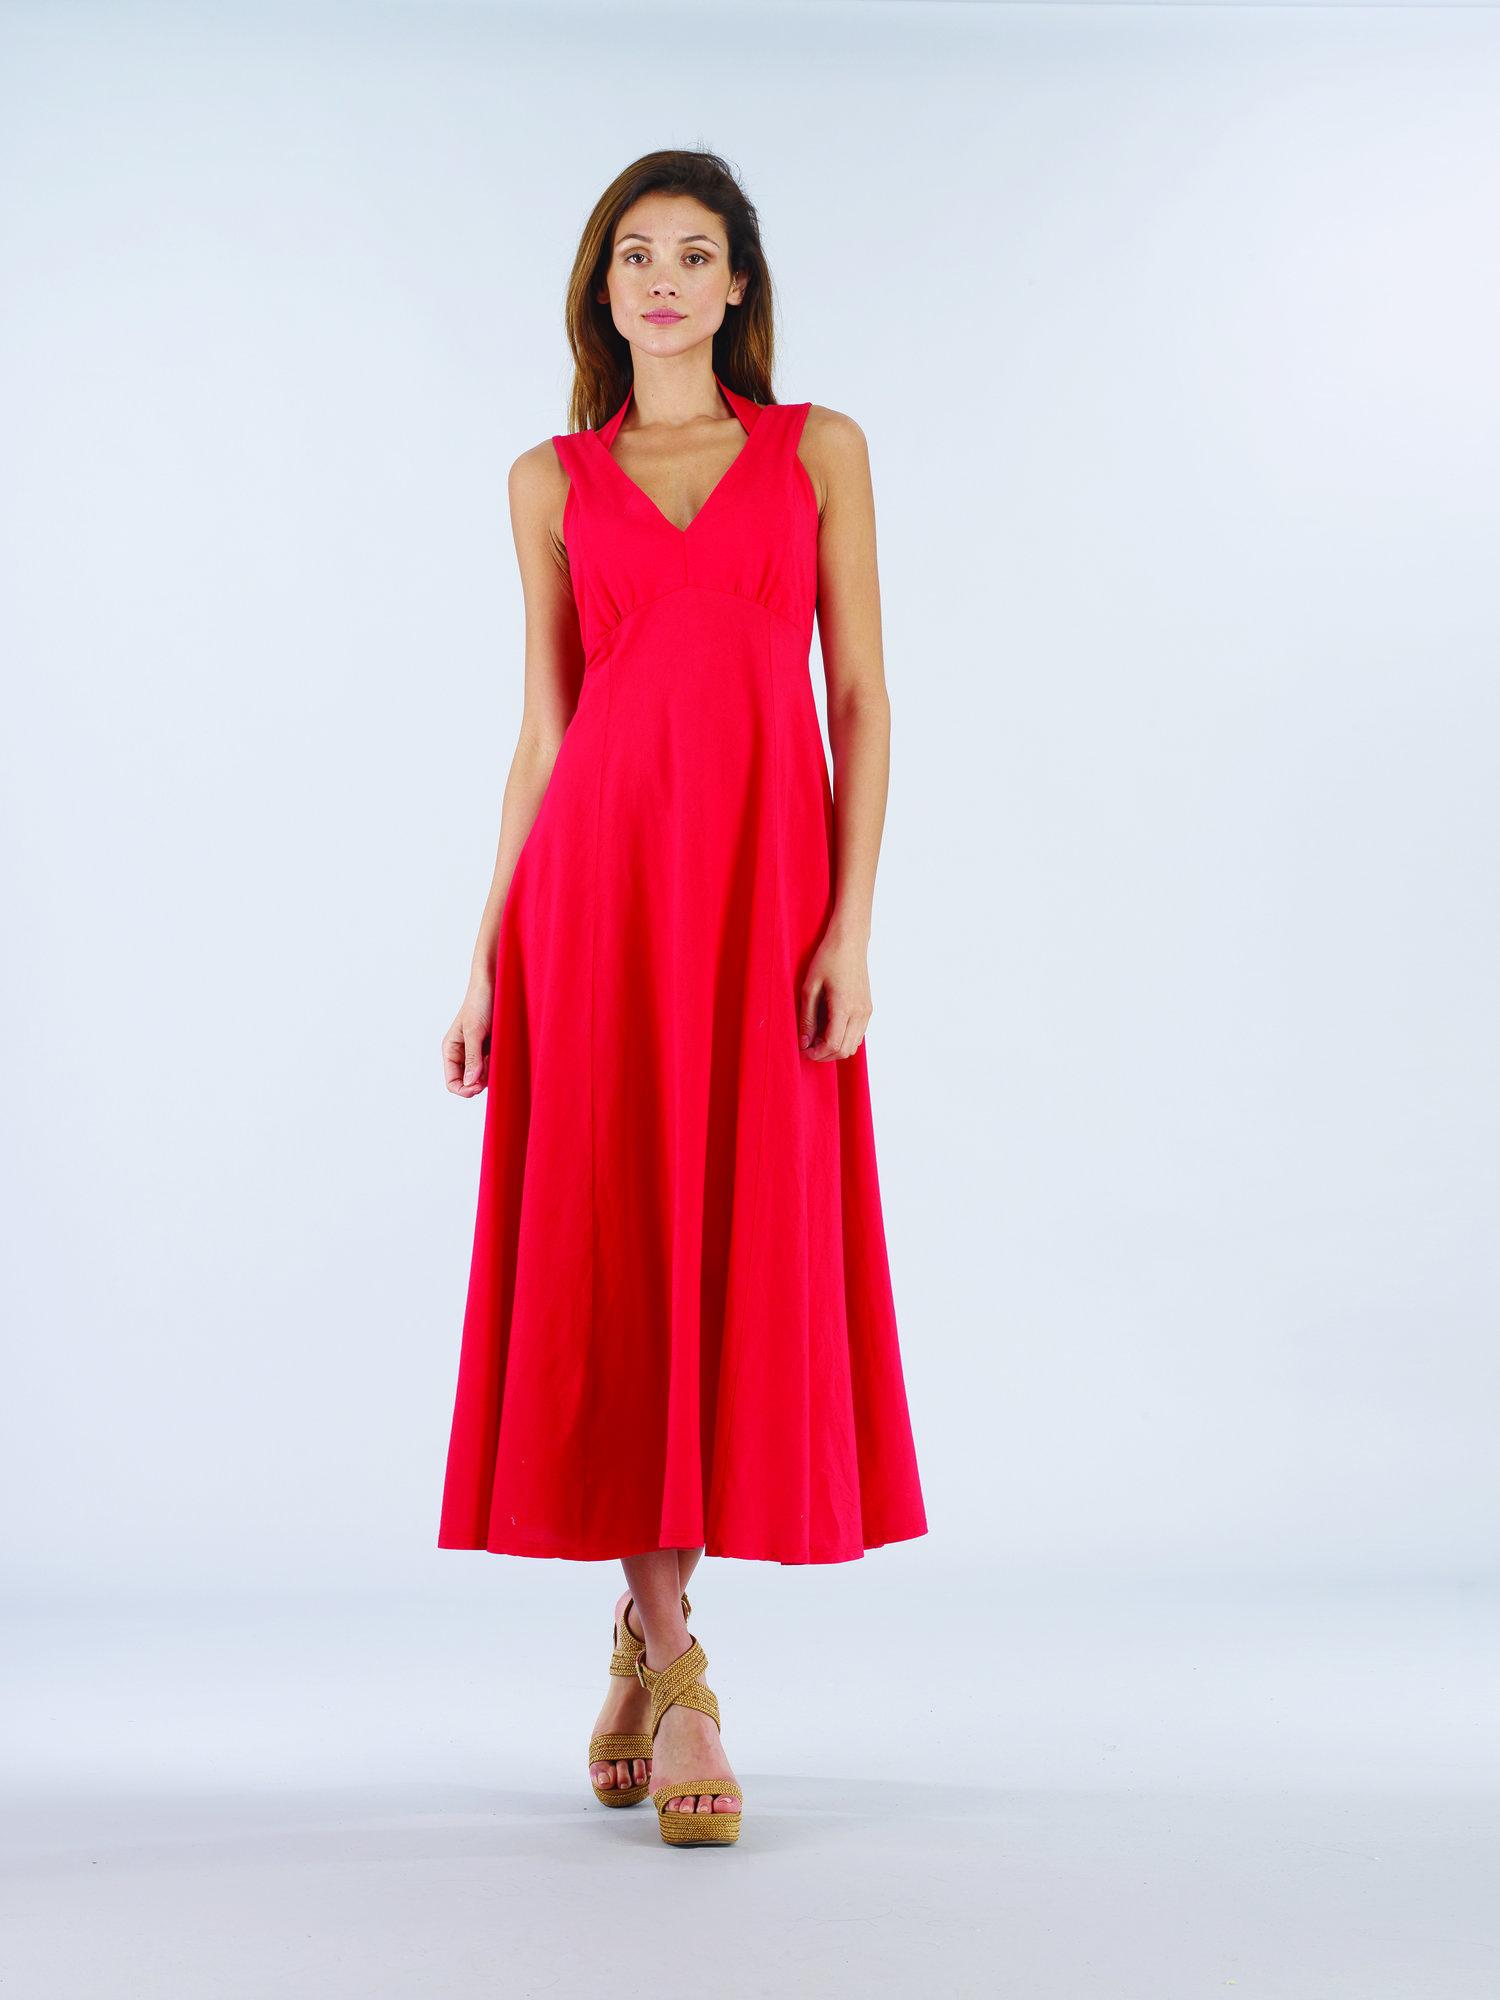 Luna Luz: Diamond Neck Cotton Muslin Dress SOLD OUT